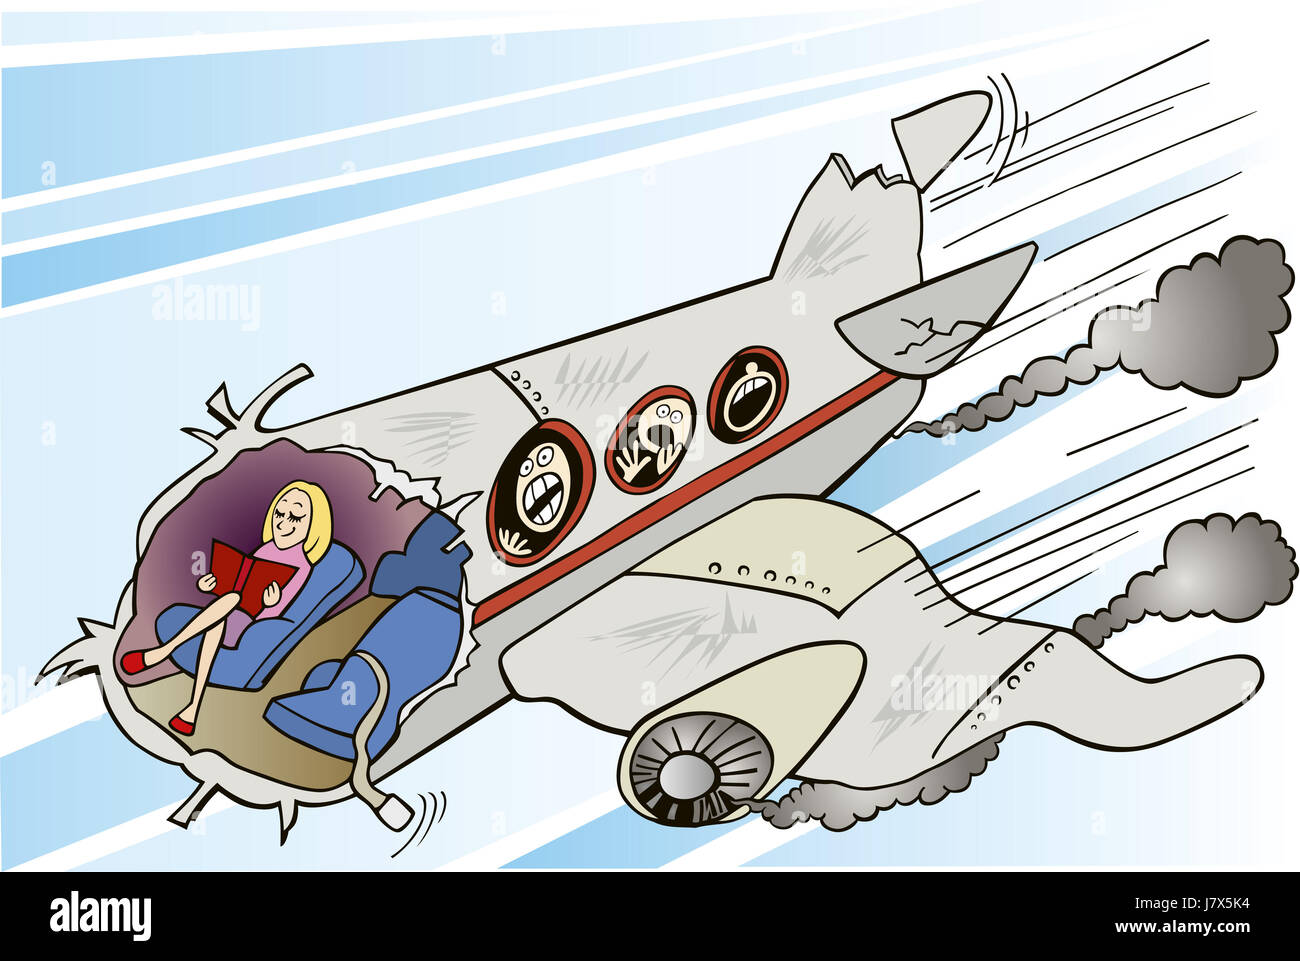 woman illustration calm cartoon crush aircraft aeroplane plane